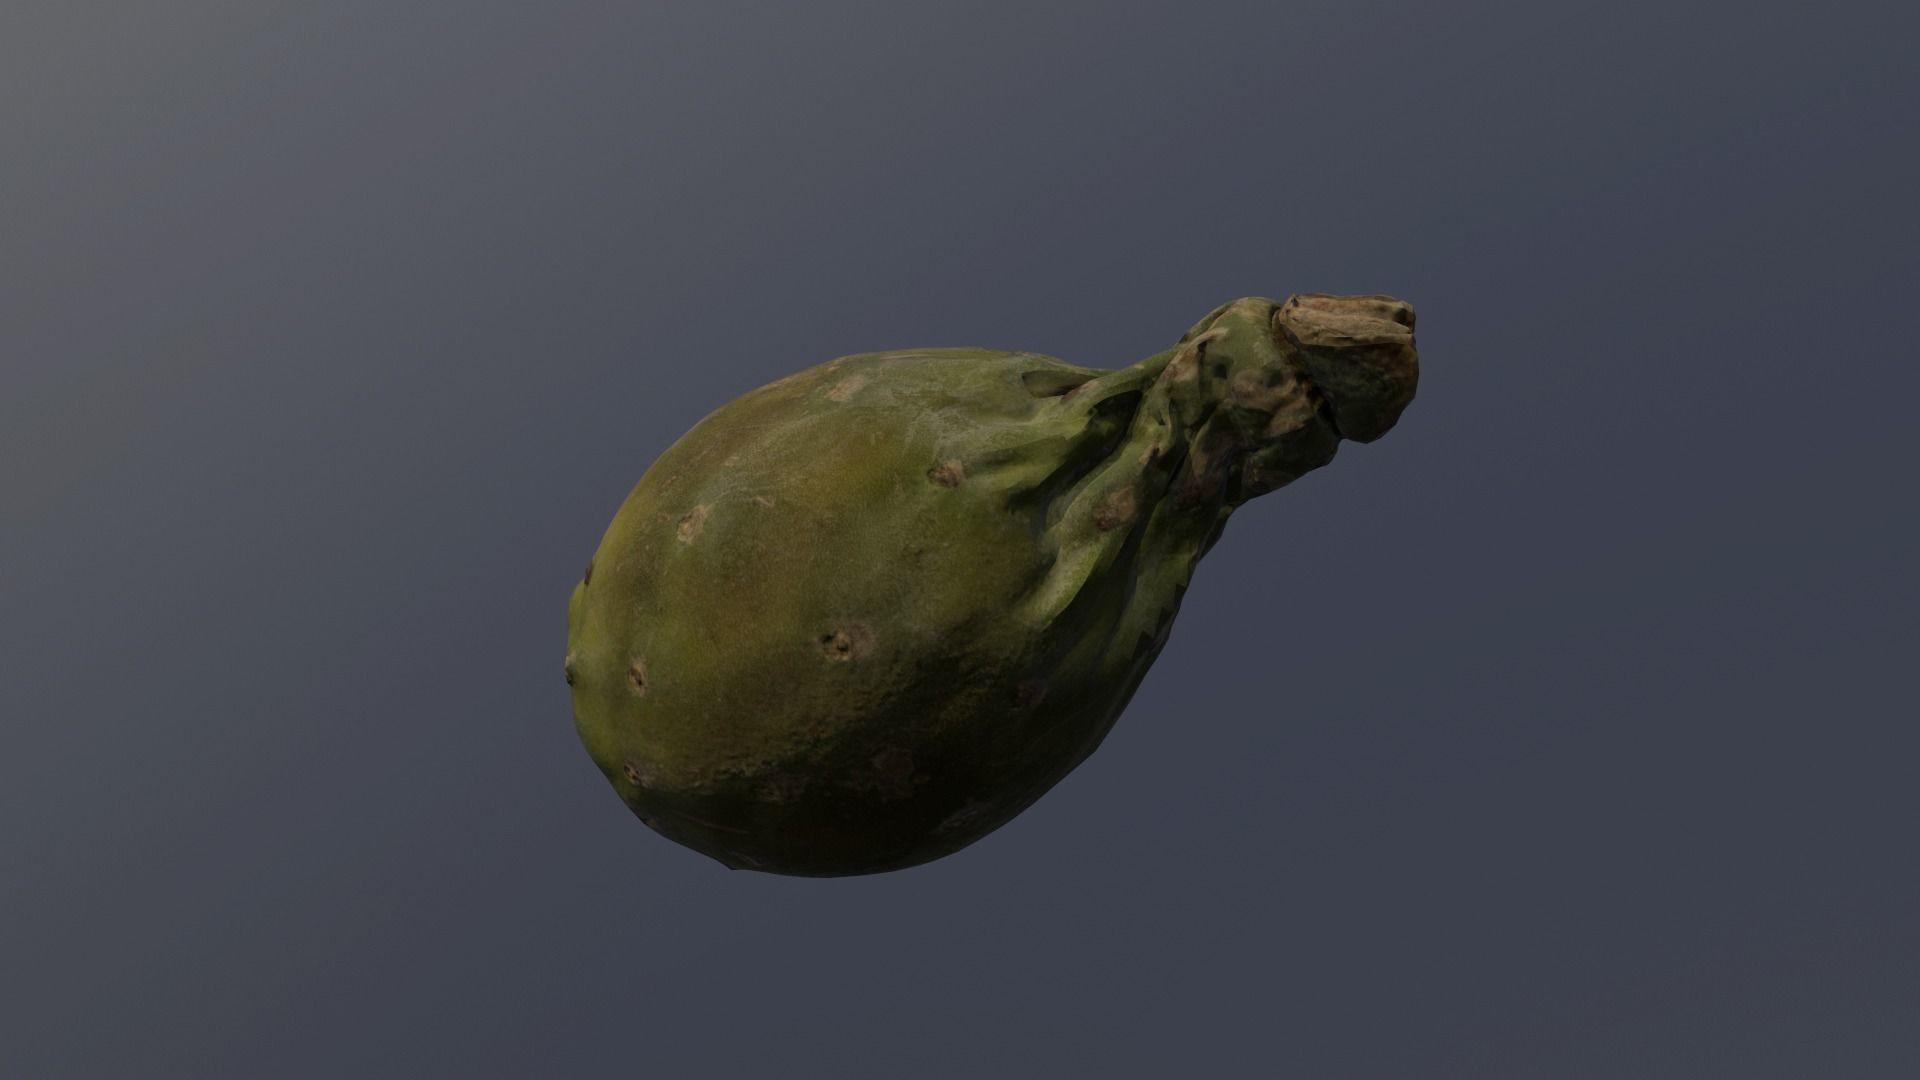 Carlos faustino opuntia ficus indica indian fig 3d model low poly obj 3ds fbx mtl 1